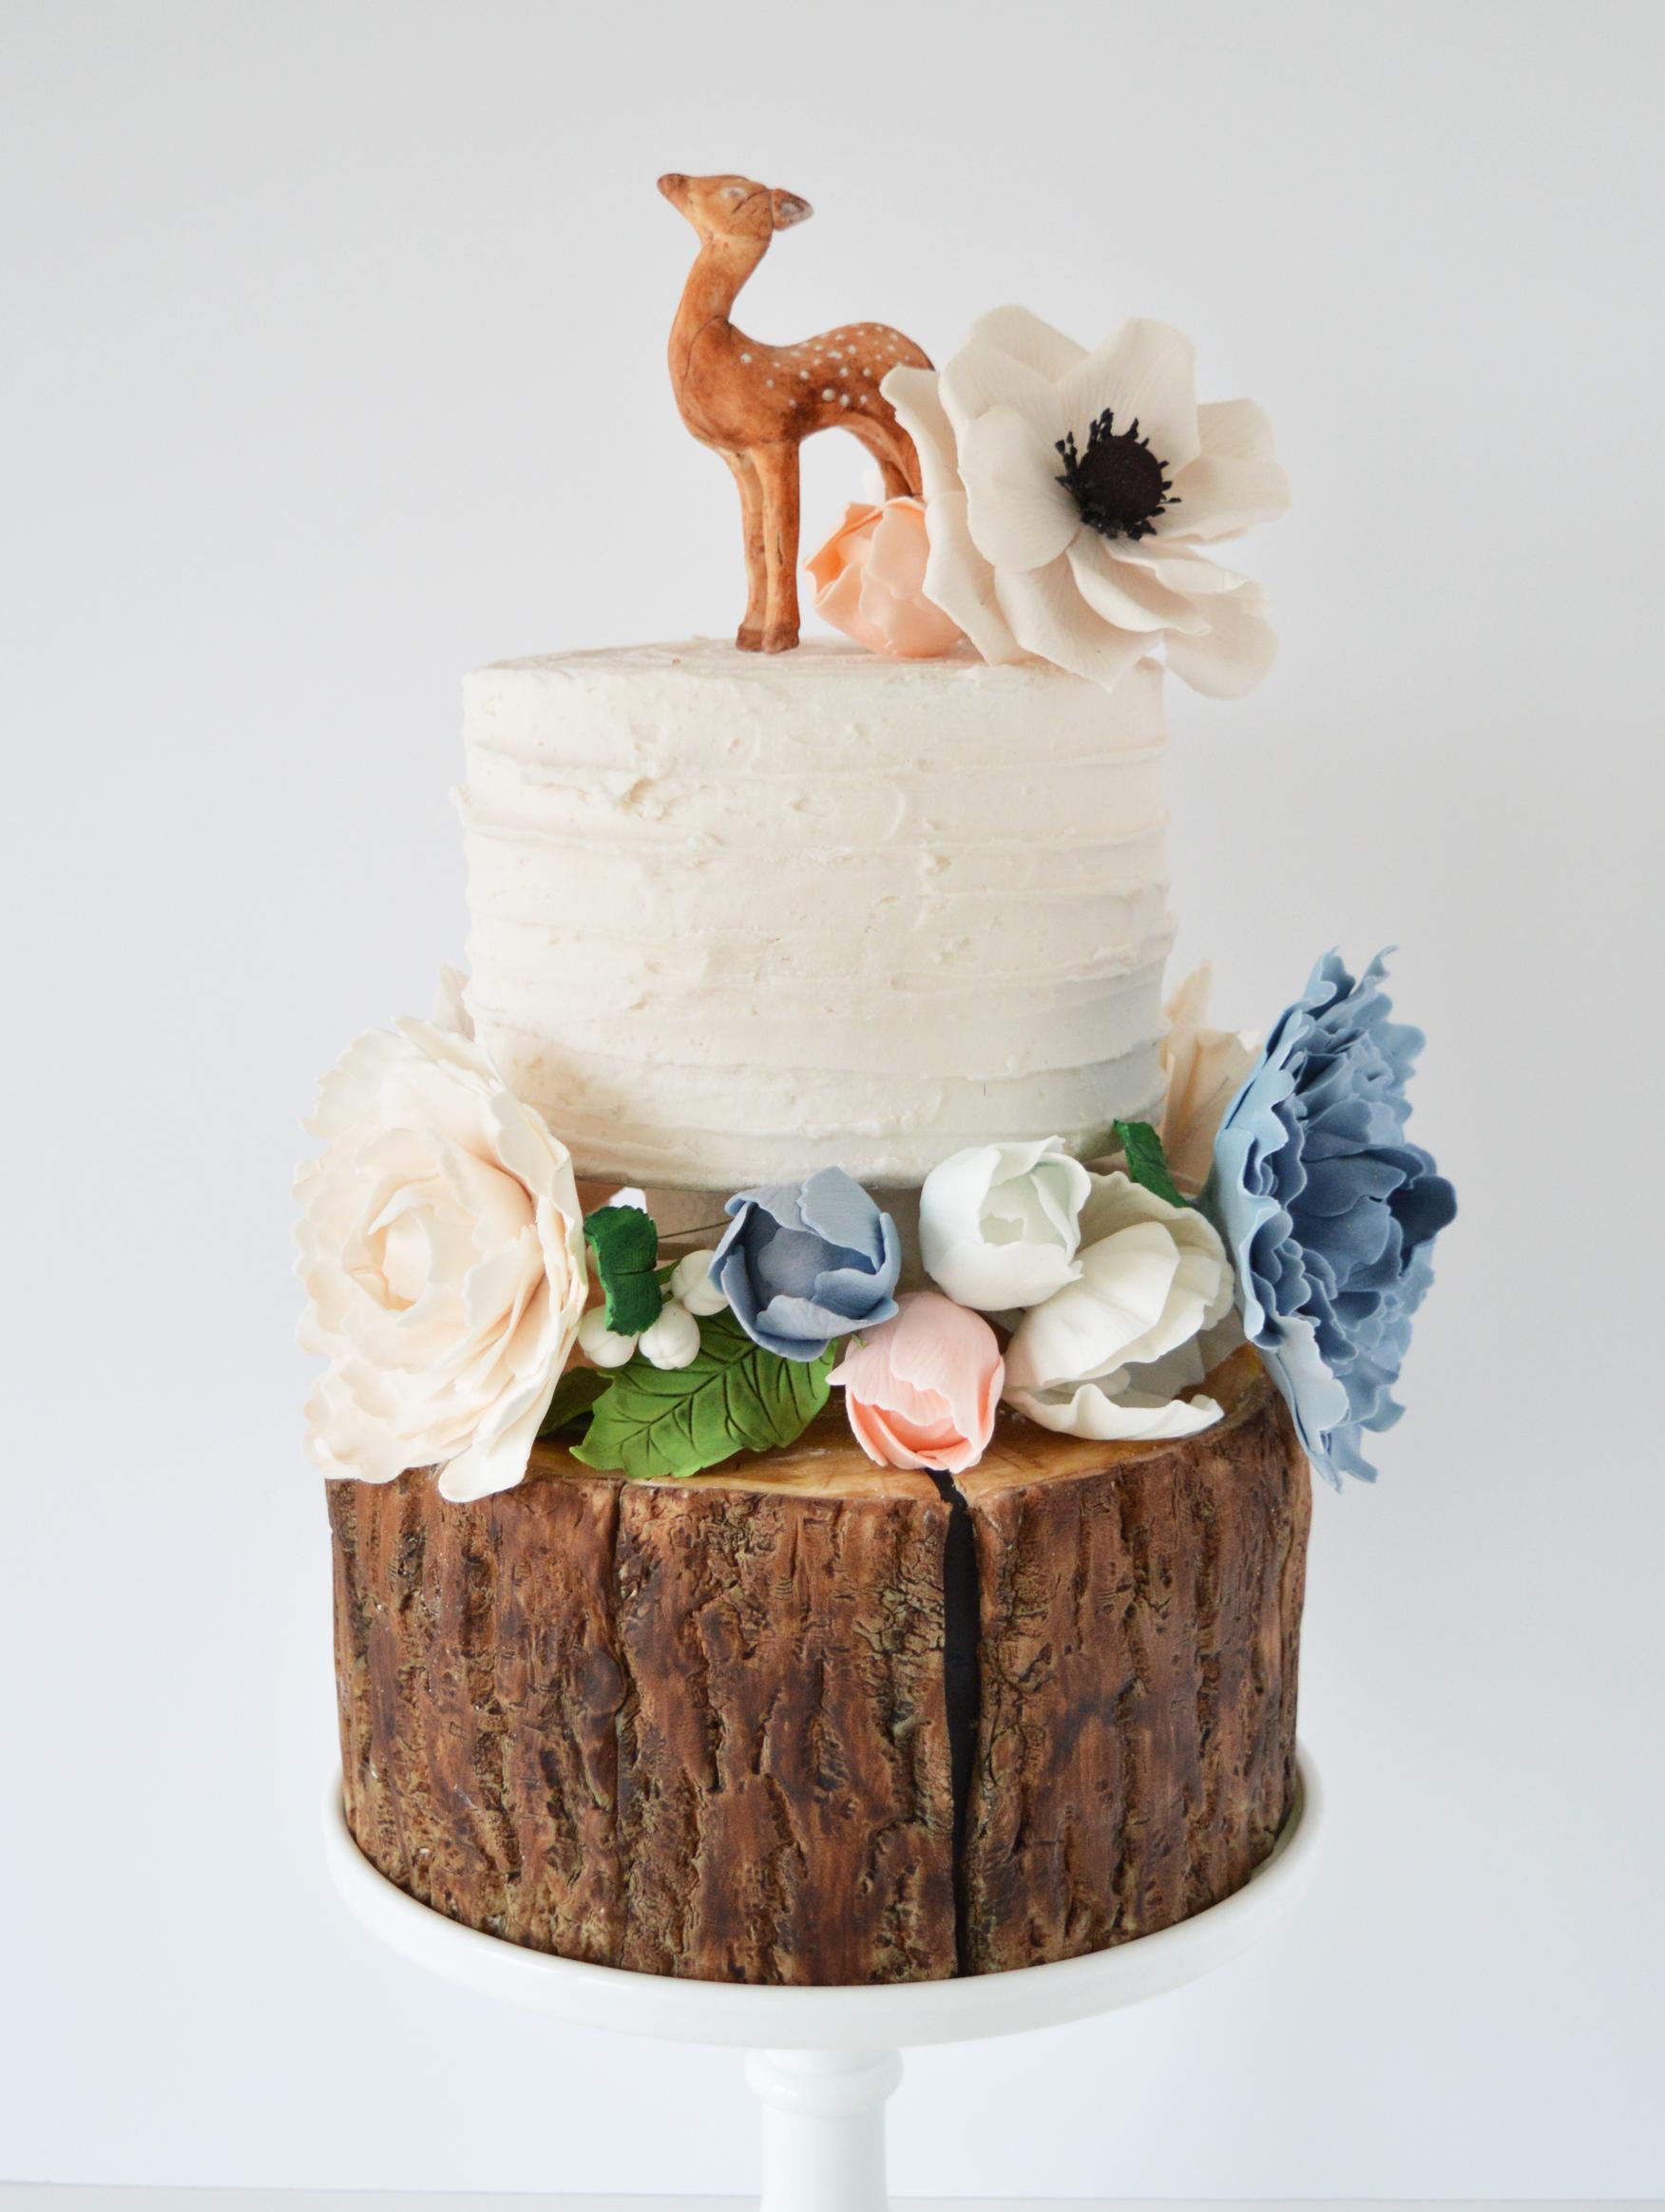 Suzanne-Esper-Suzanne-Esper-Cake-Seasonal-Celebration-Spring.png#asset:11837